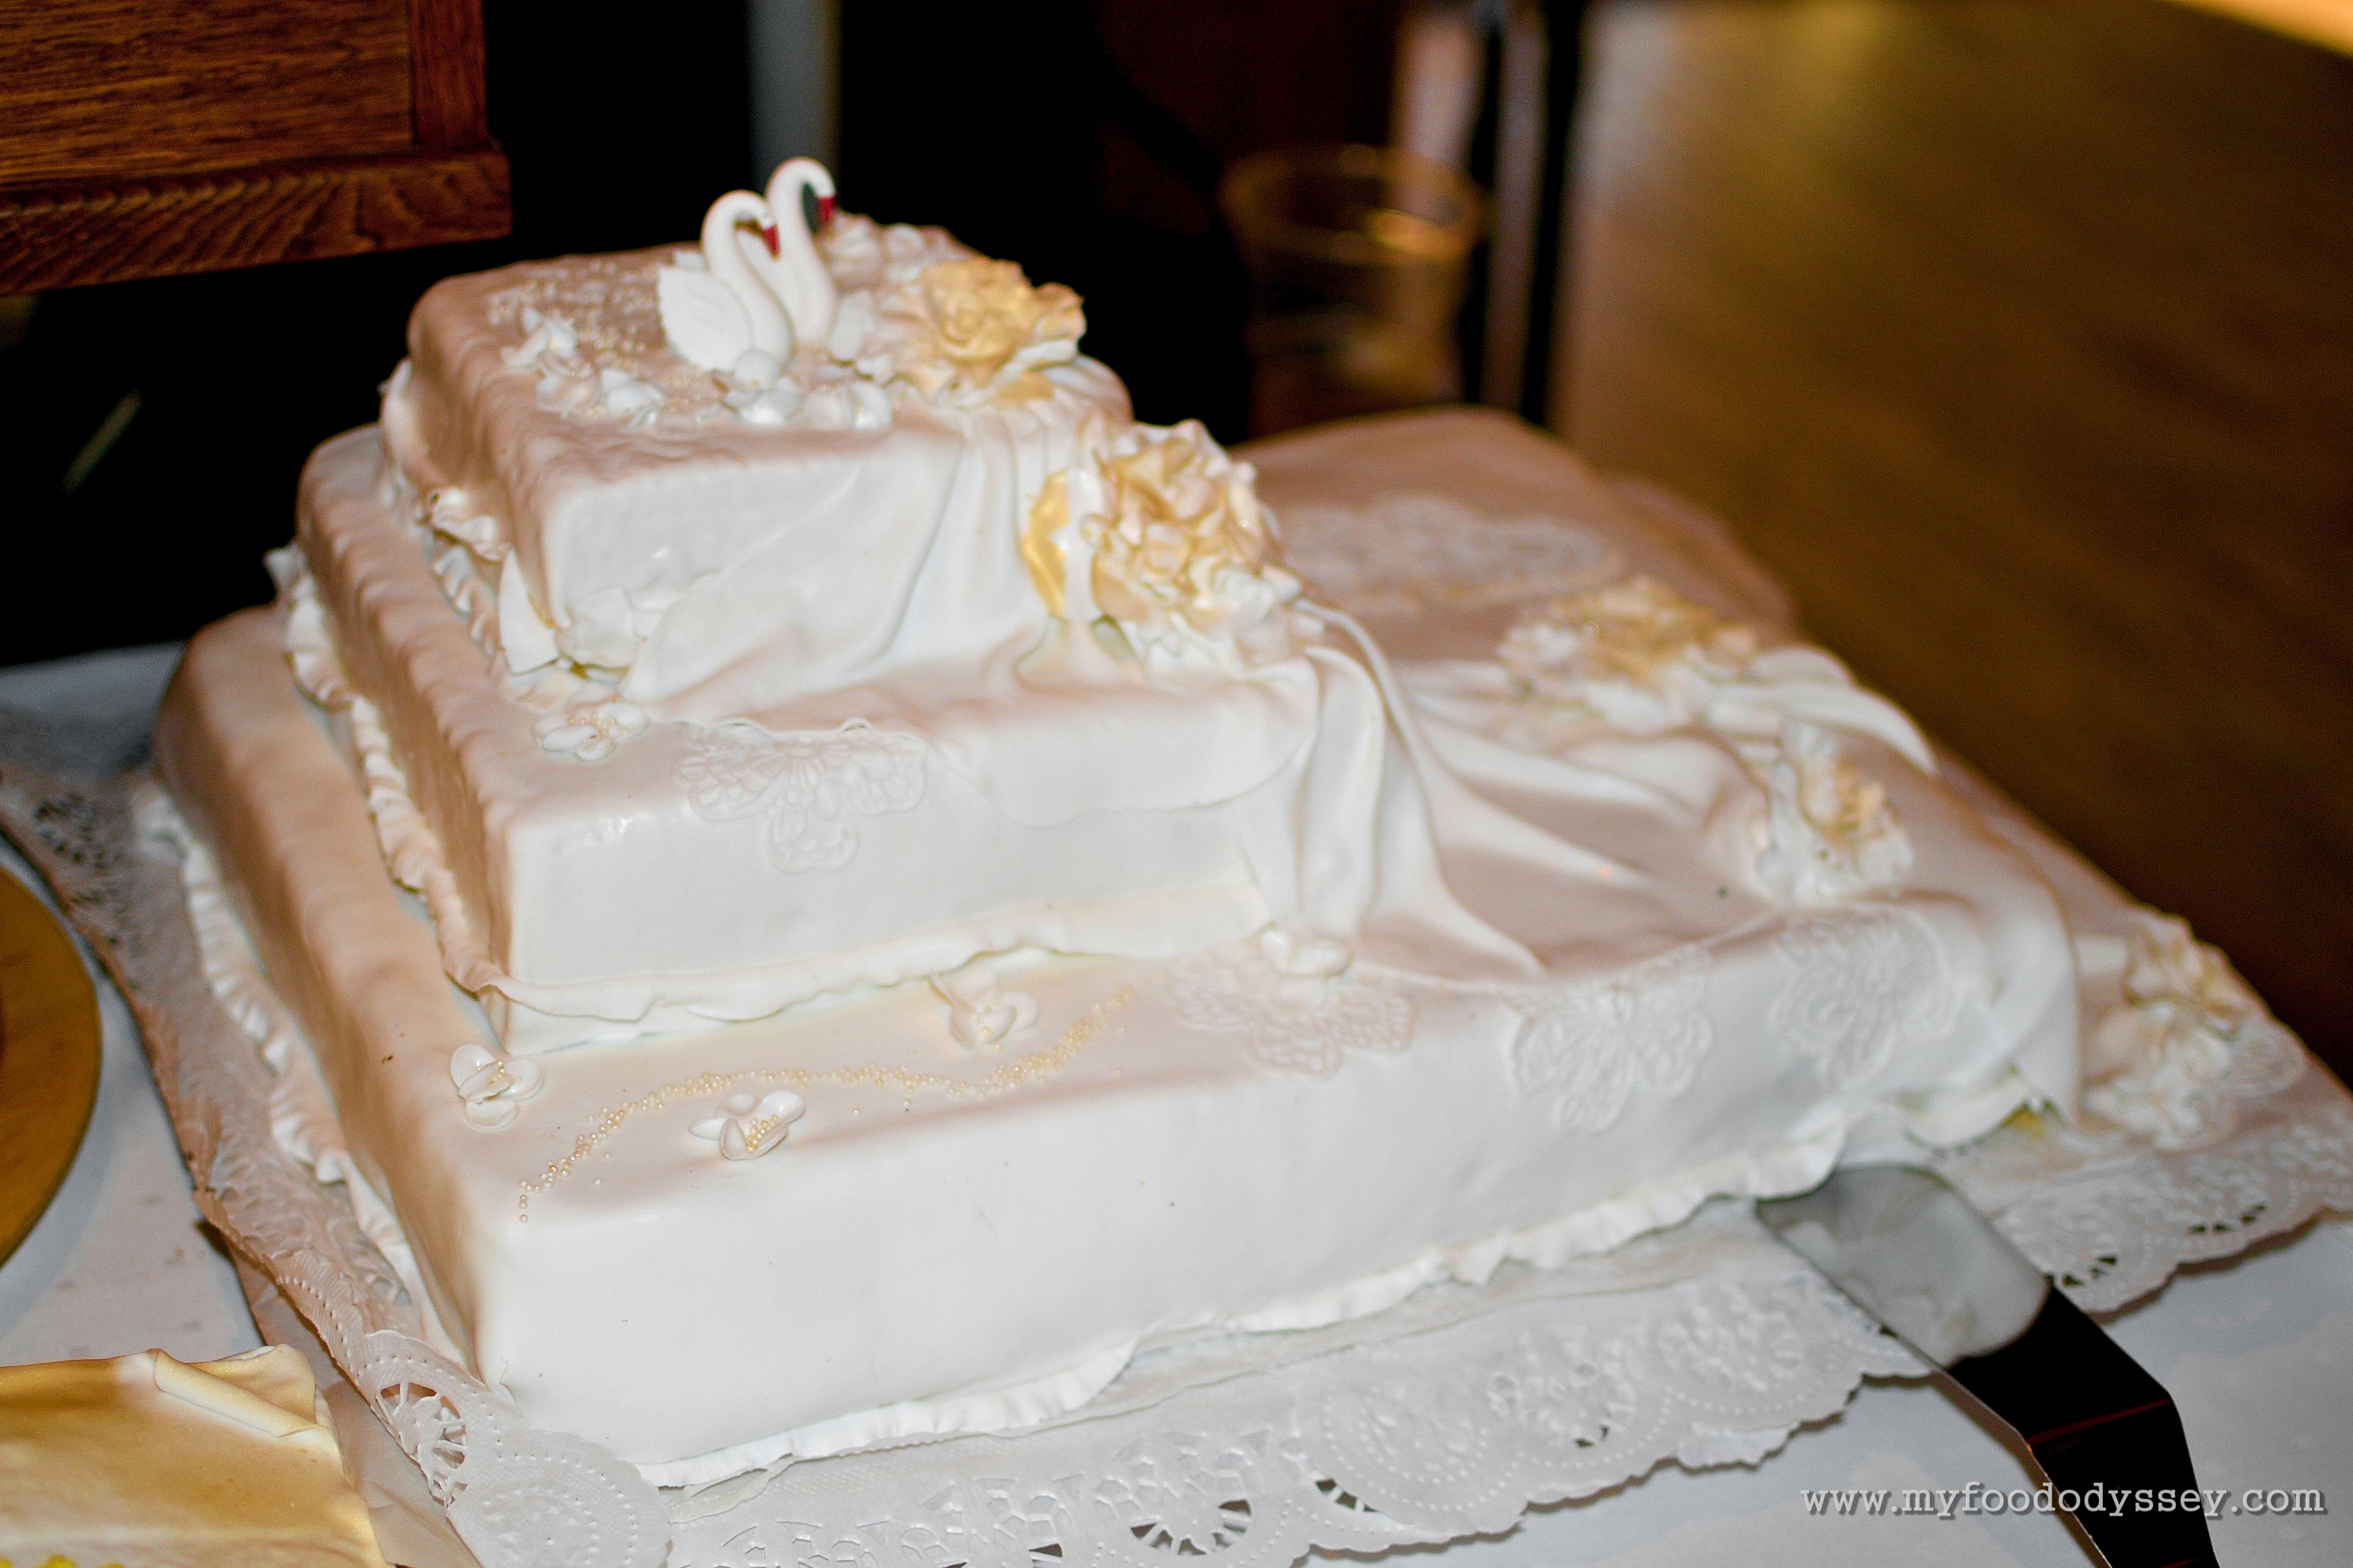 A Lithuanian Wedding   My Food Odyssey